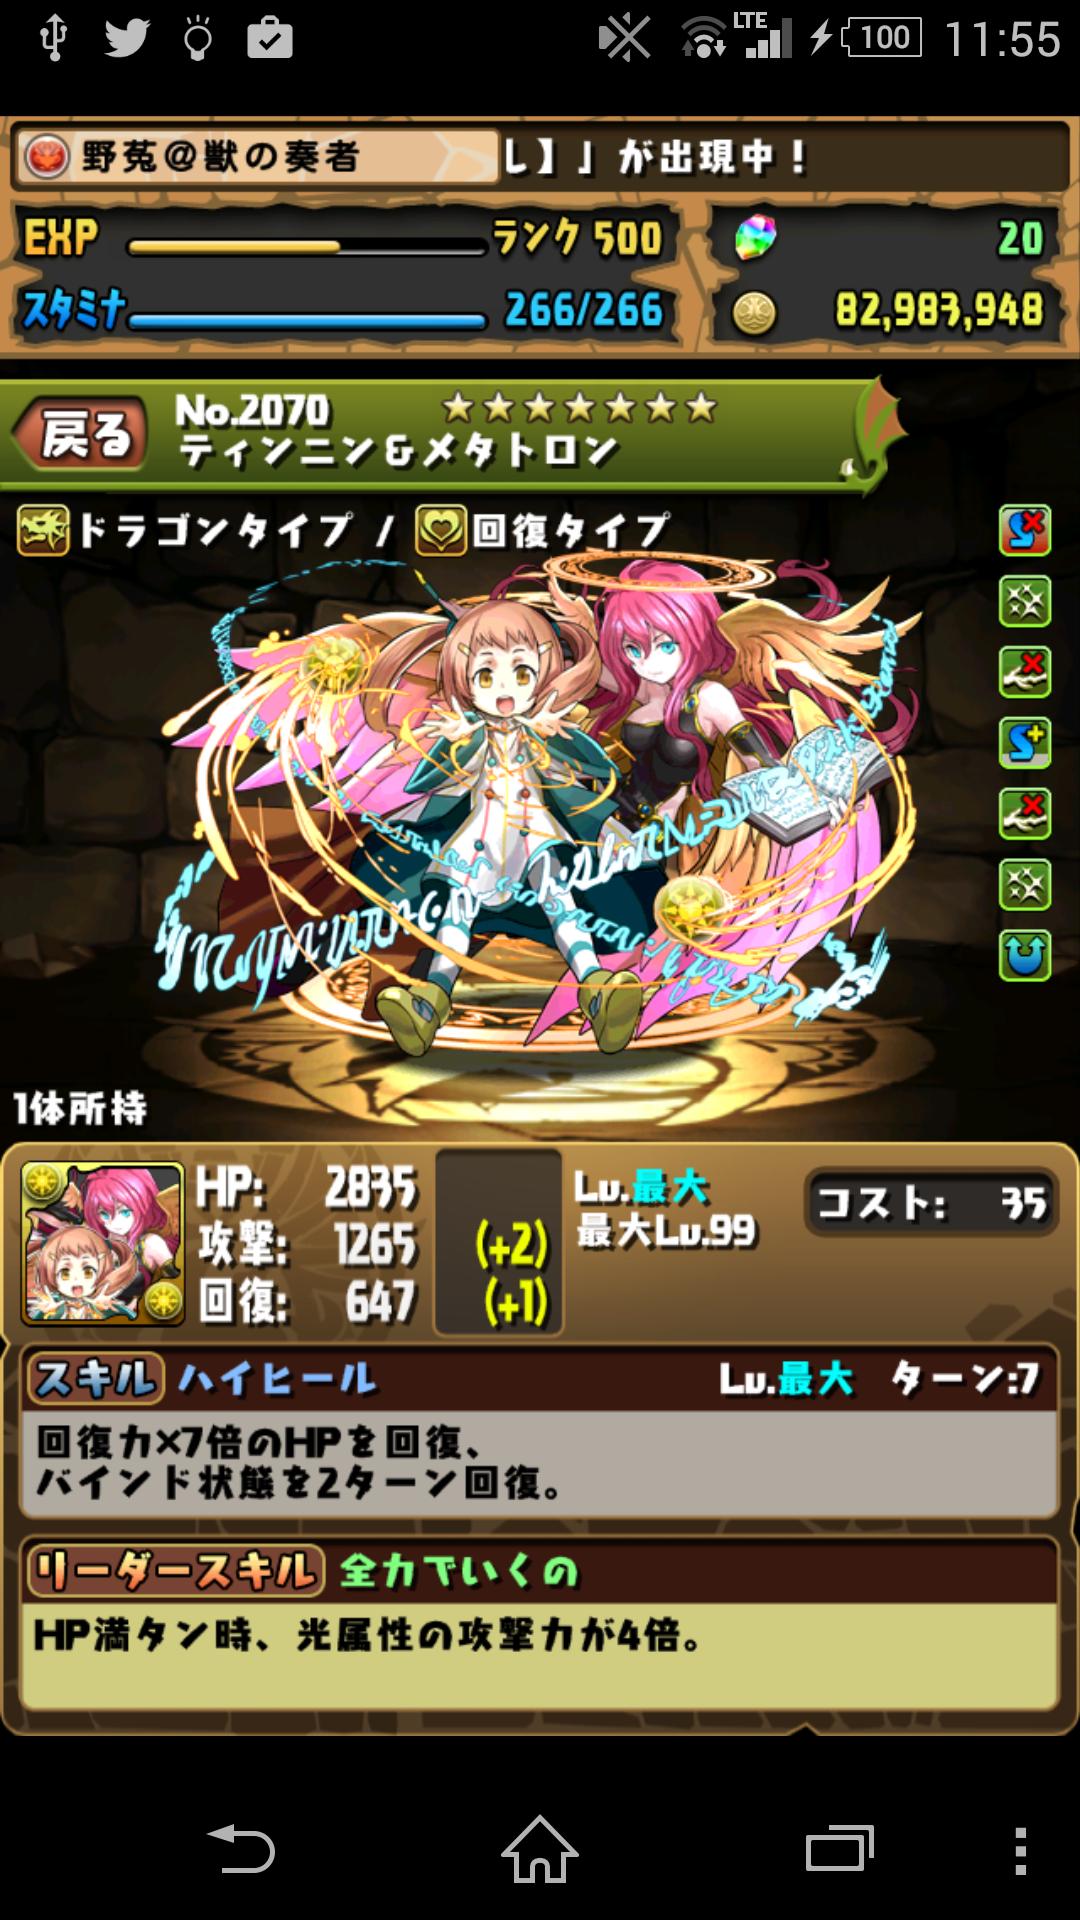 Screenshot_2015-05-14-11-55-18.png